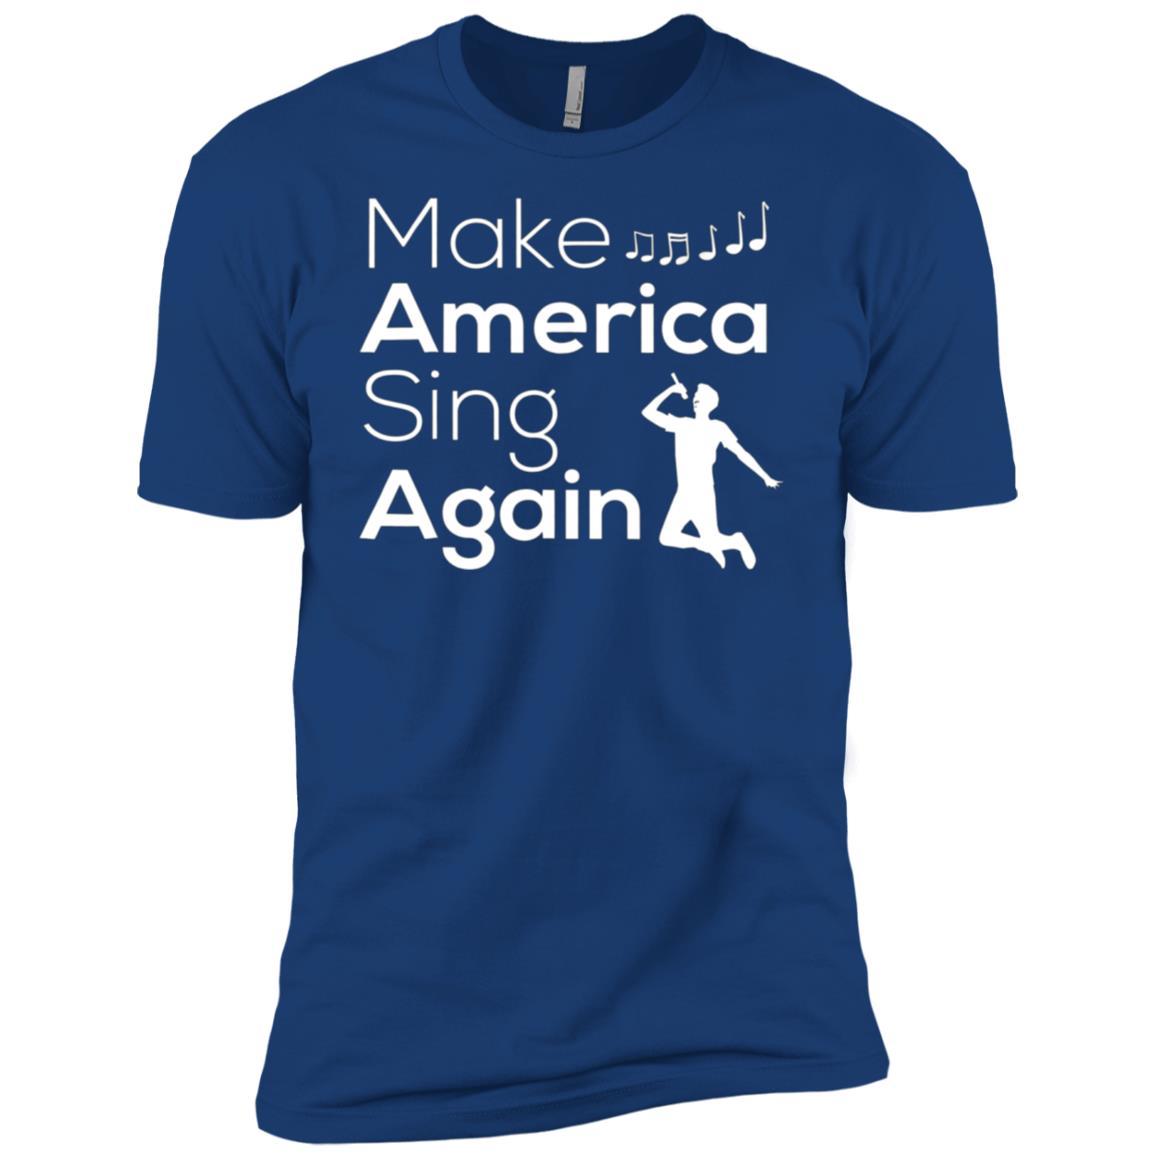 Make America Sing Again Funny Singing Lover Tee Men Short Sleeve T-Shirt